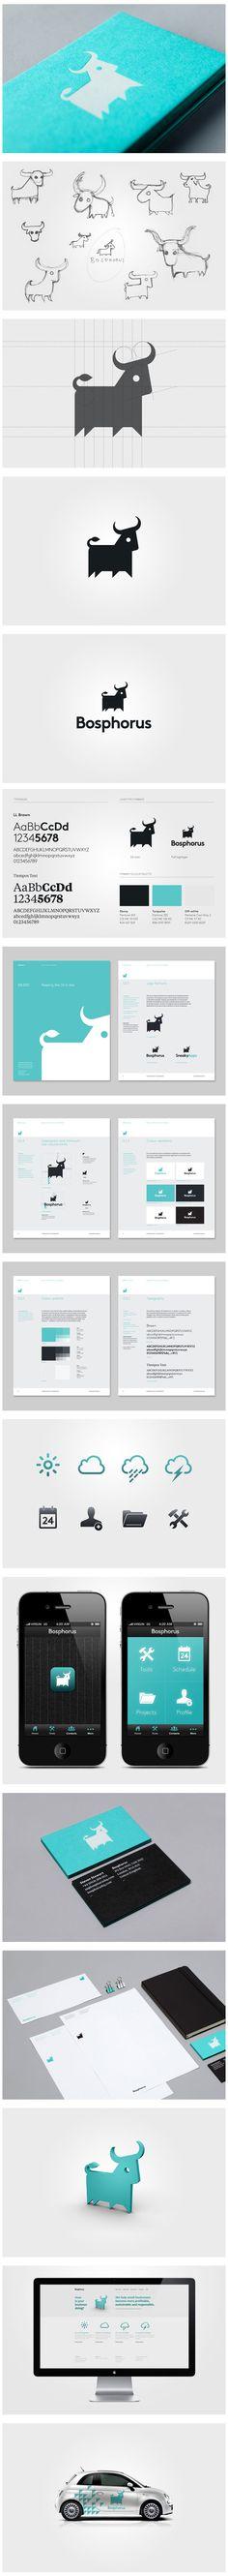 corporate design, graphic design, brand guidelines, visual identity, icon design, identity branding, logos design, mike colling, ident brand